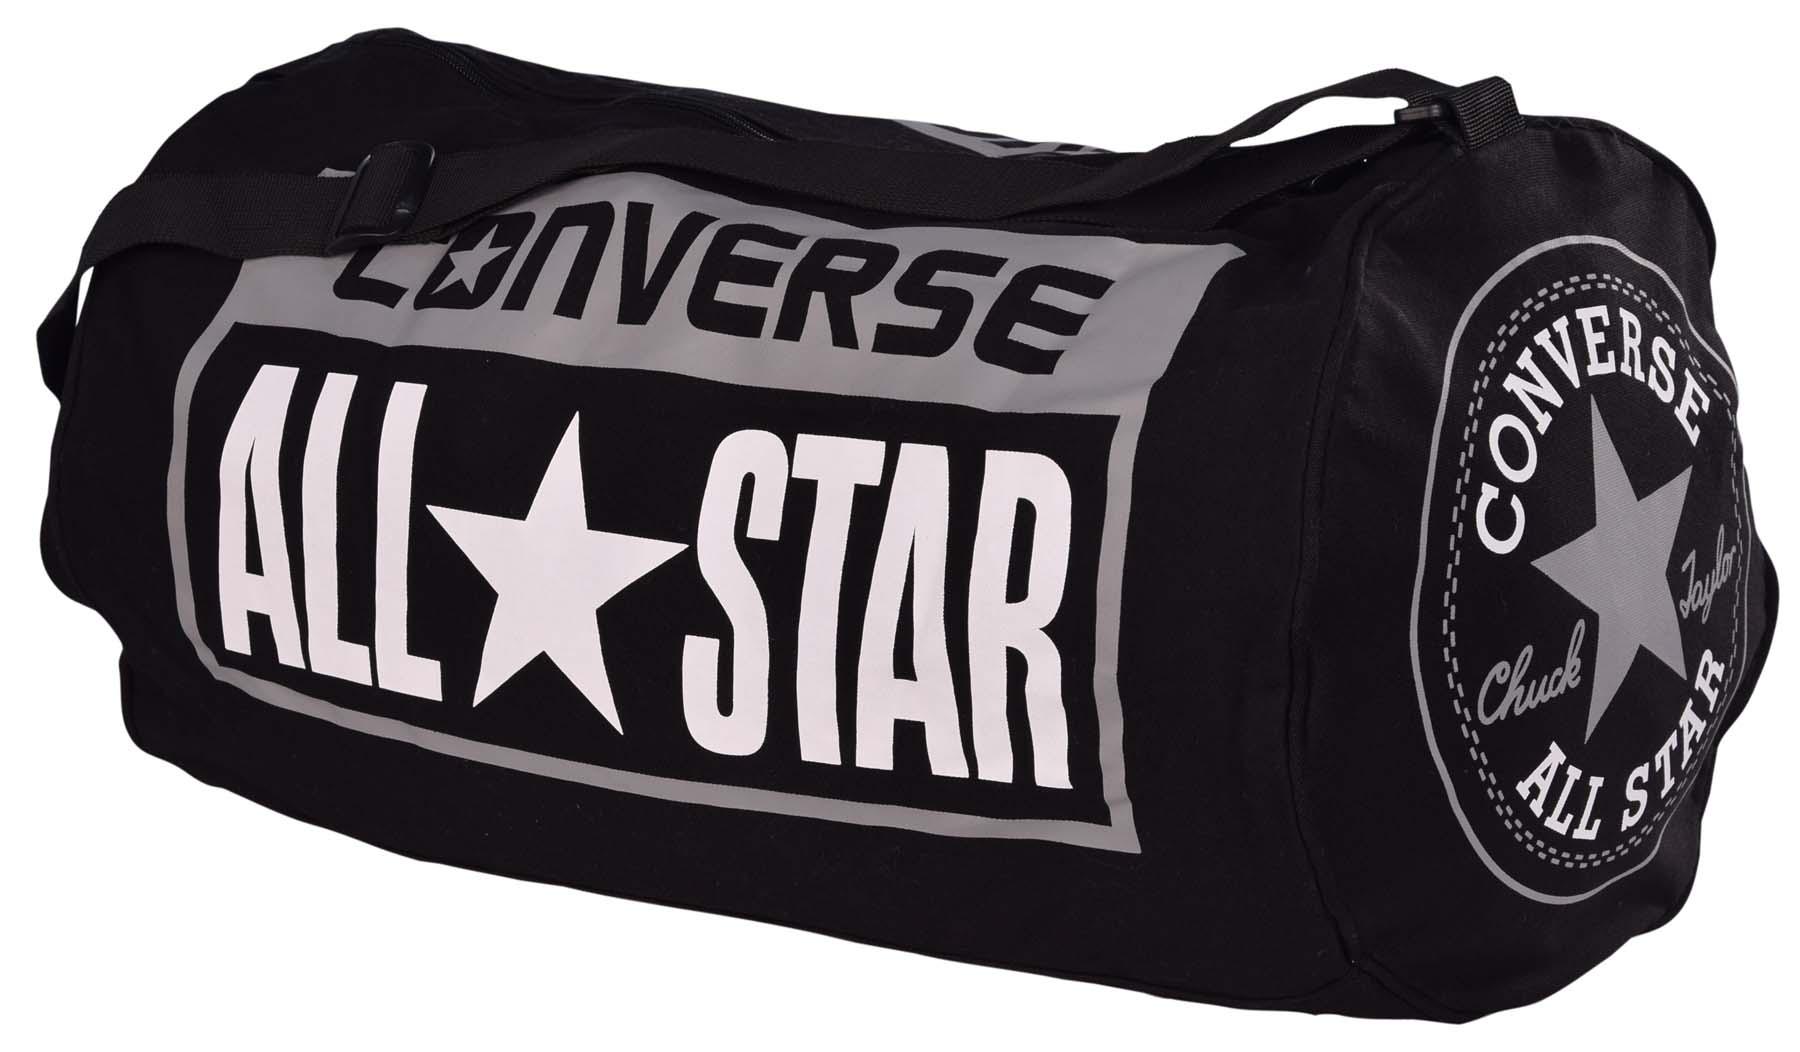 Converse-Legacy-All-Star-Patch-Duffle-Duffel-Bag-Black